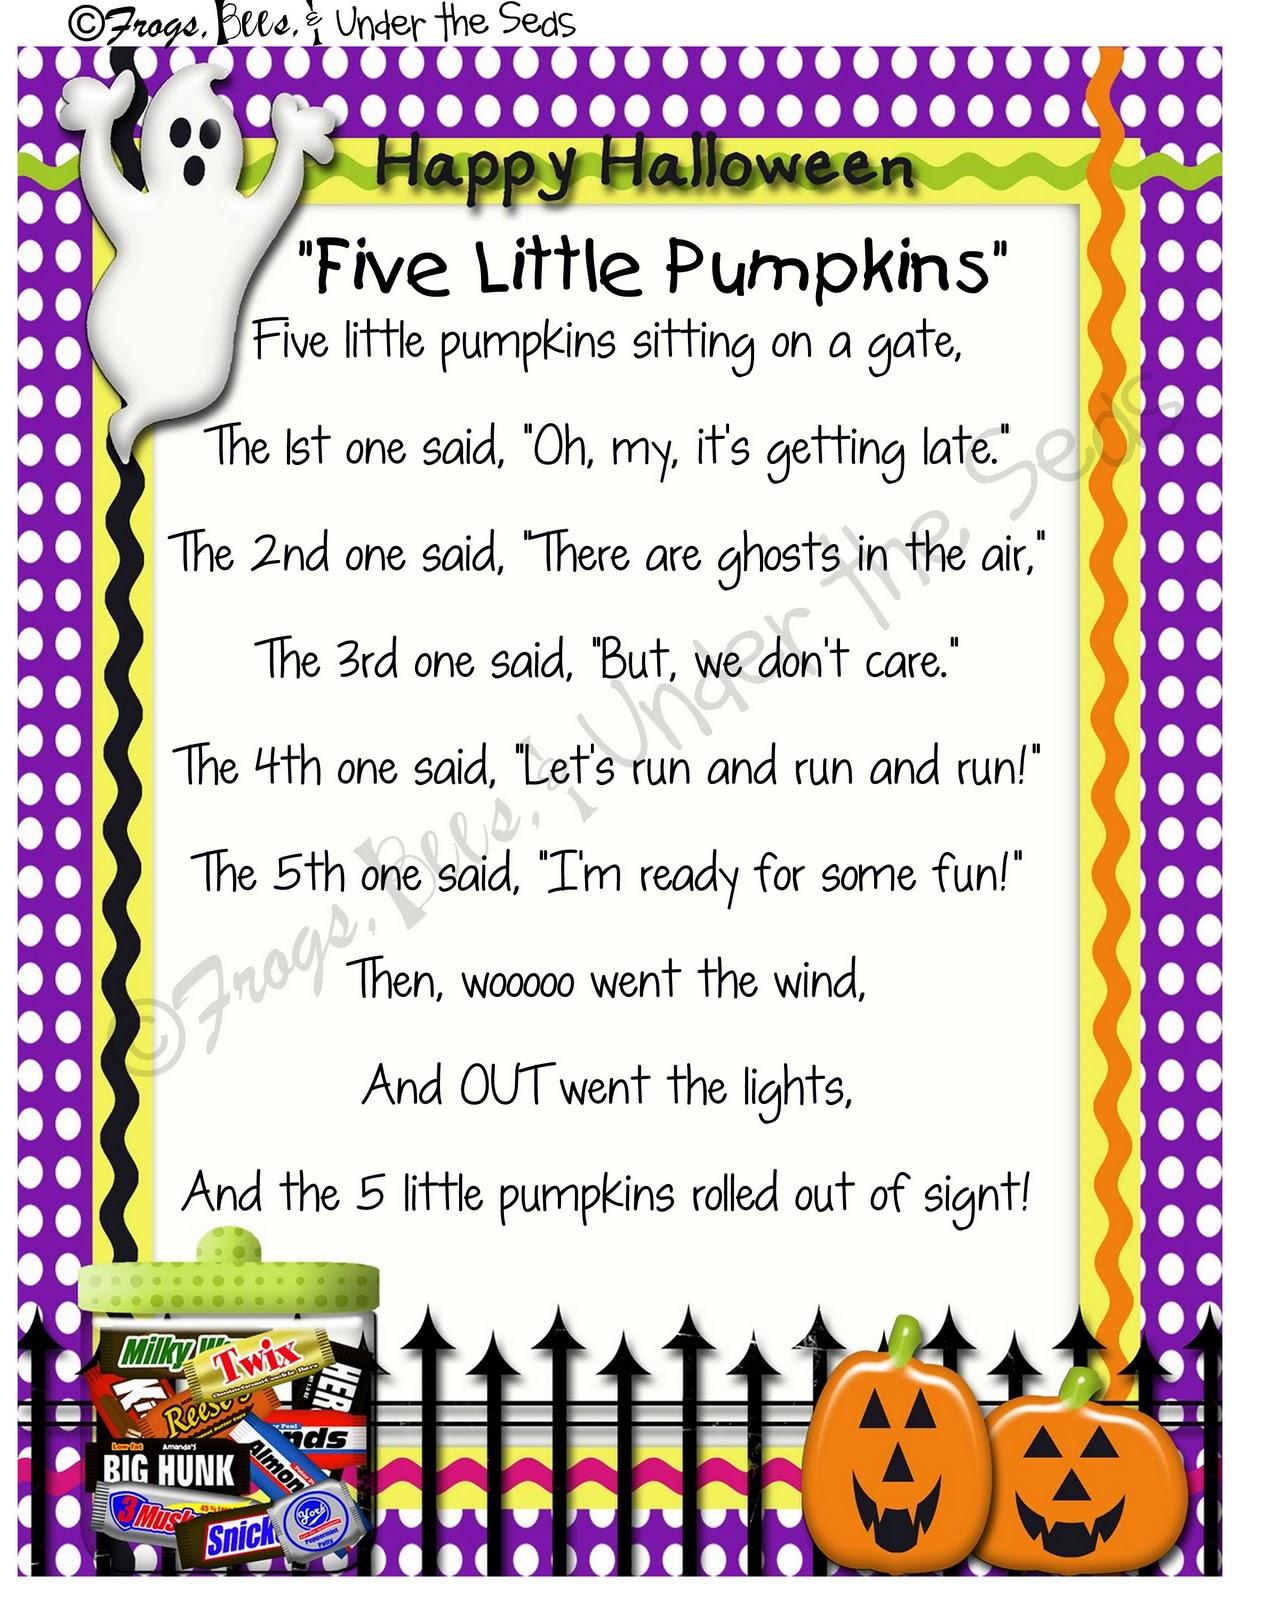 Pixie Chicks New In The Shop Five Little Pumpkins